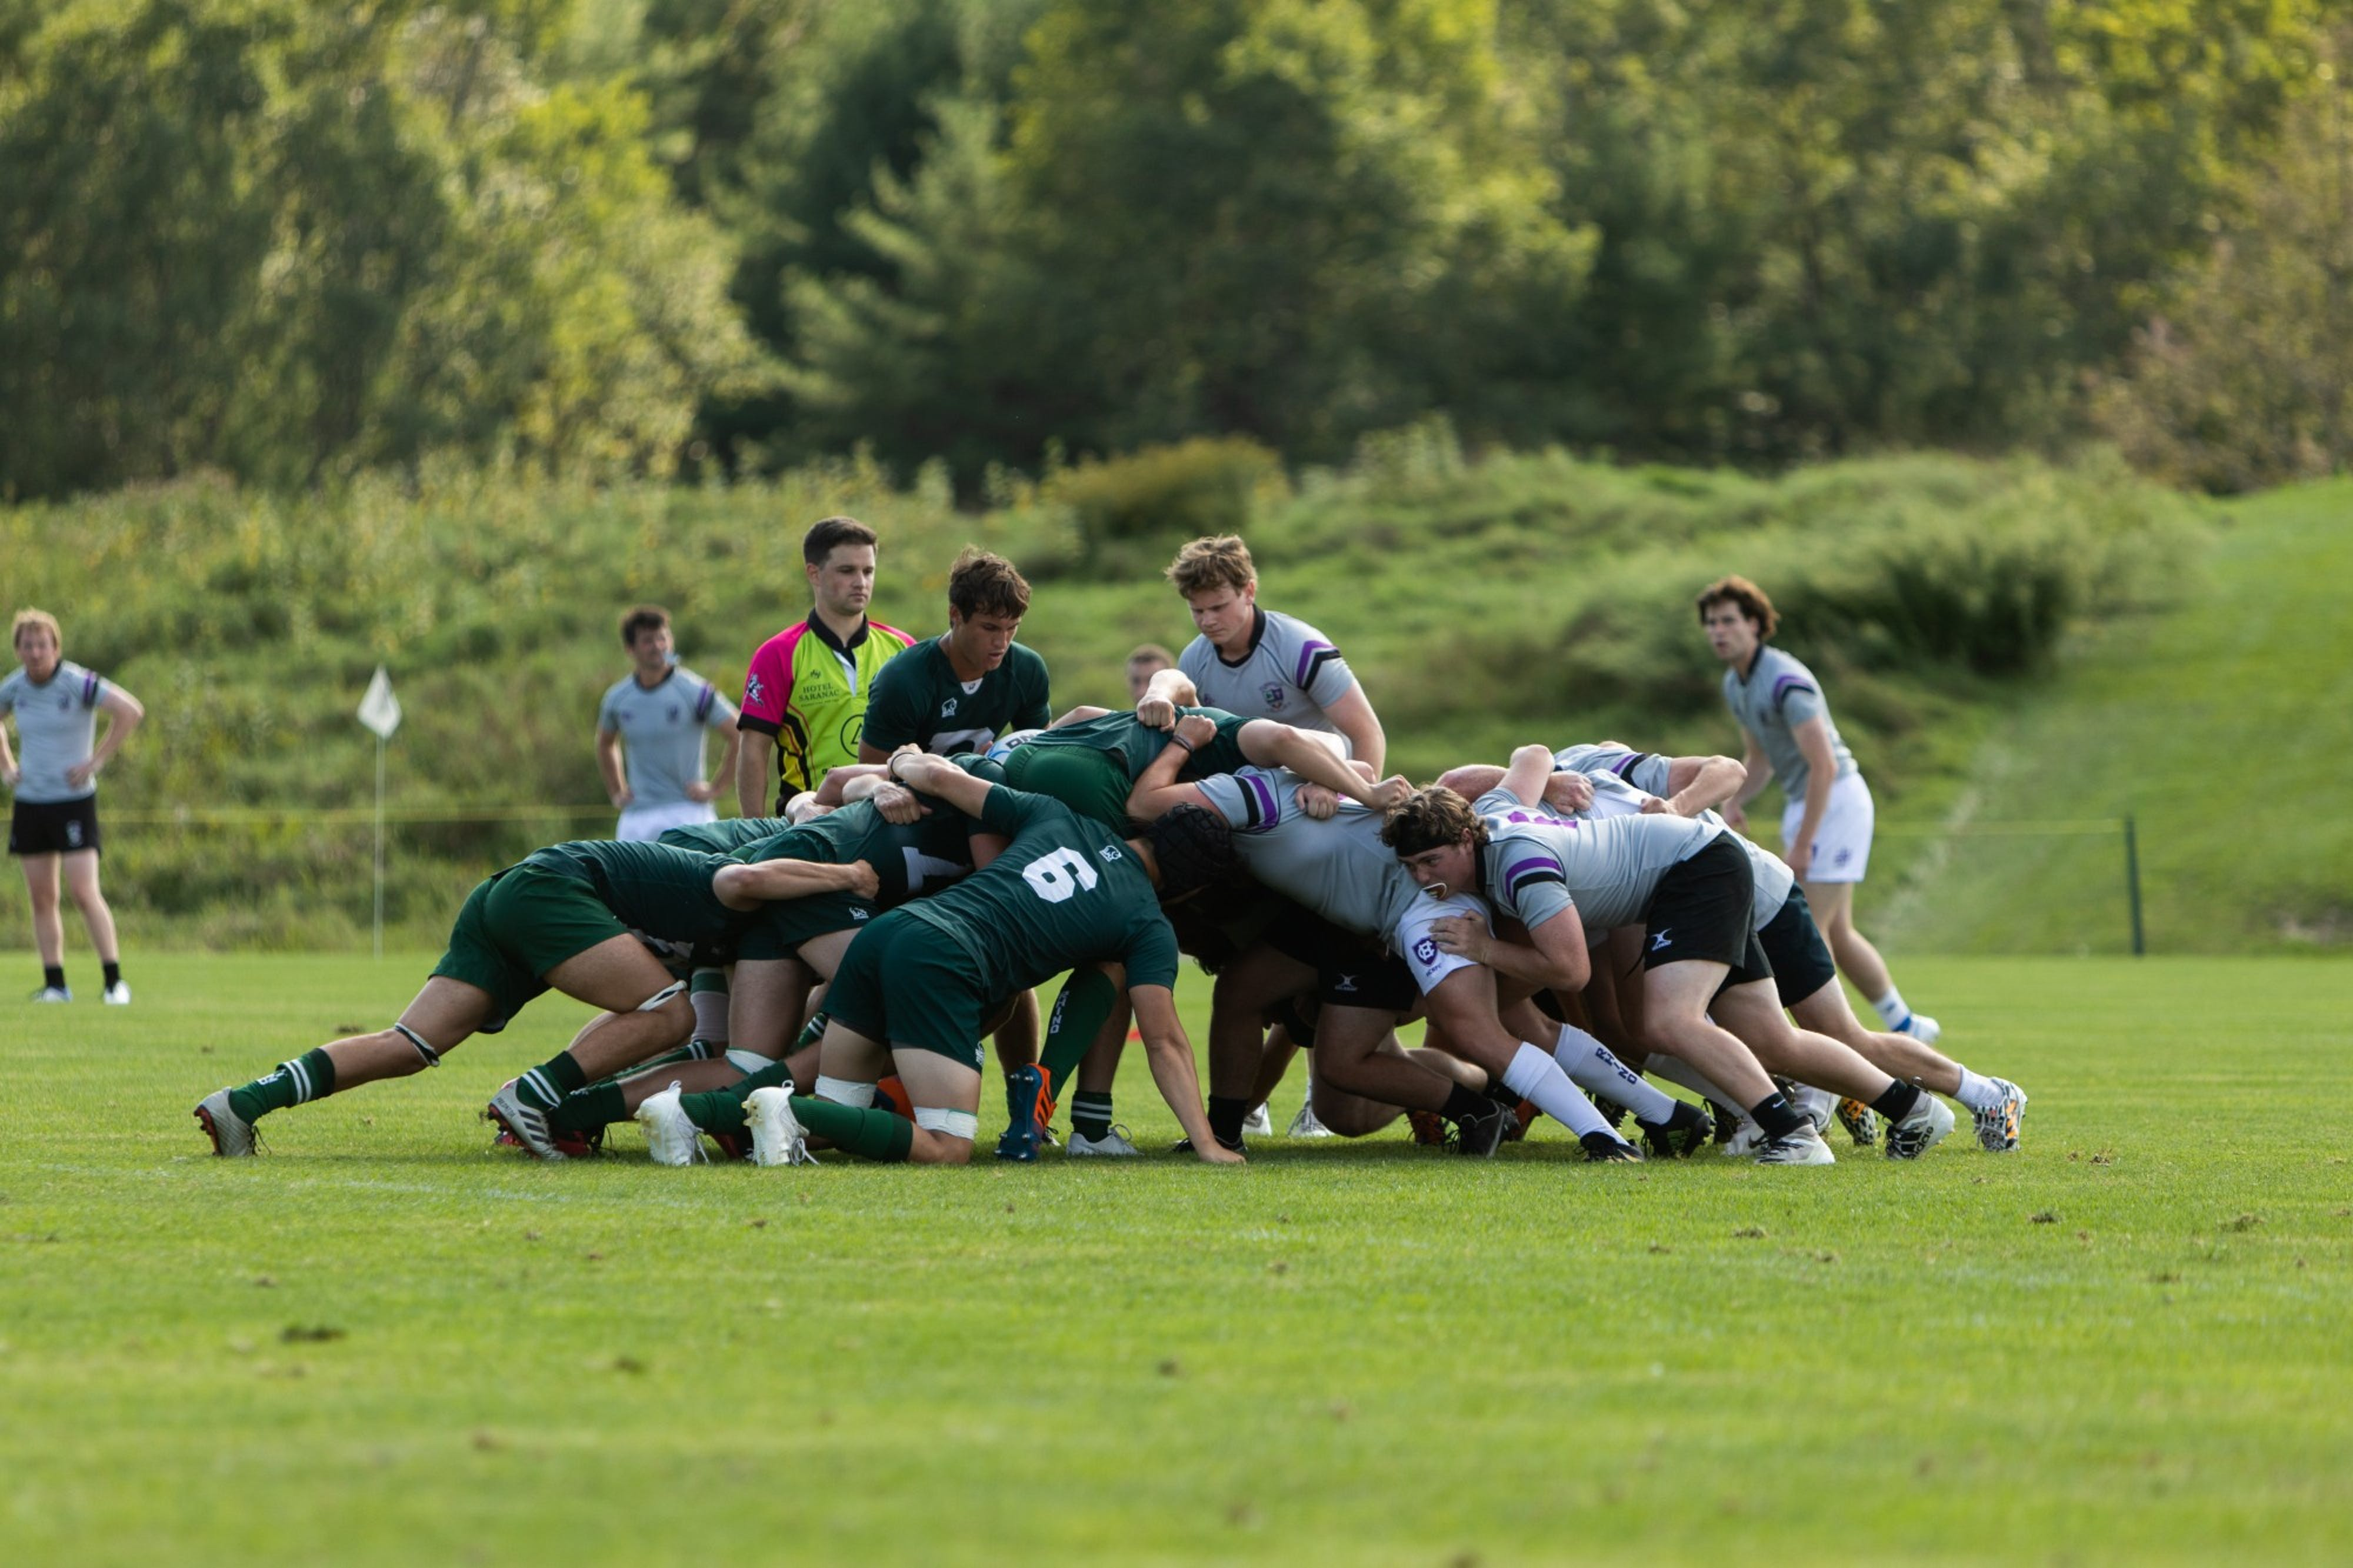 9-20-21-rugby-carolinekramer